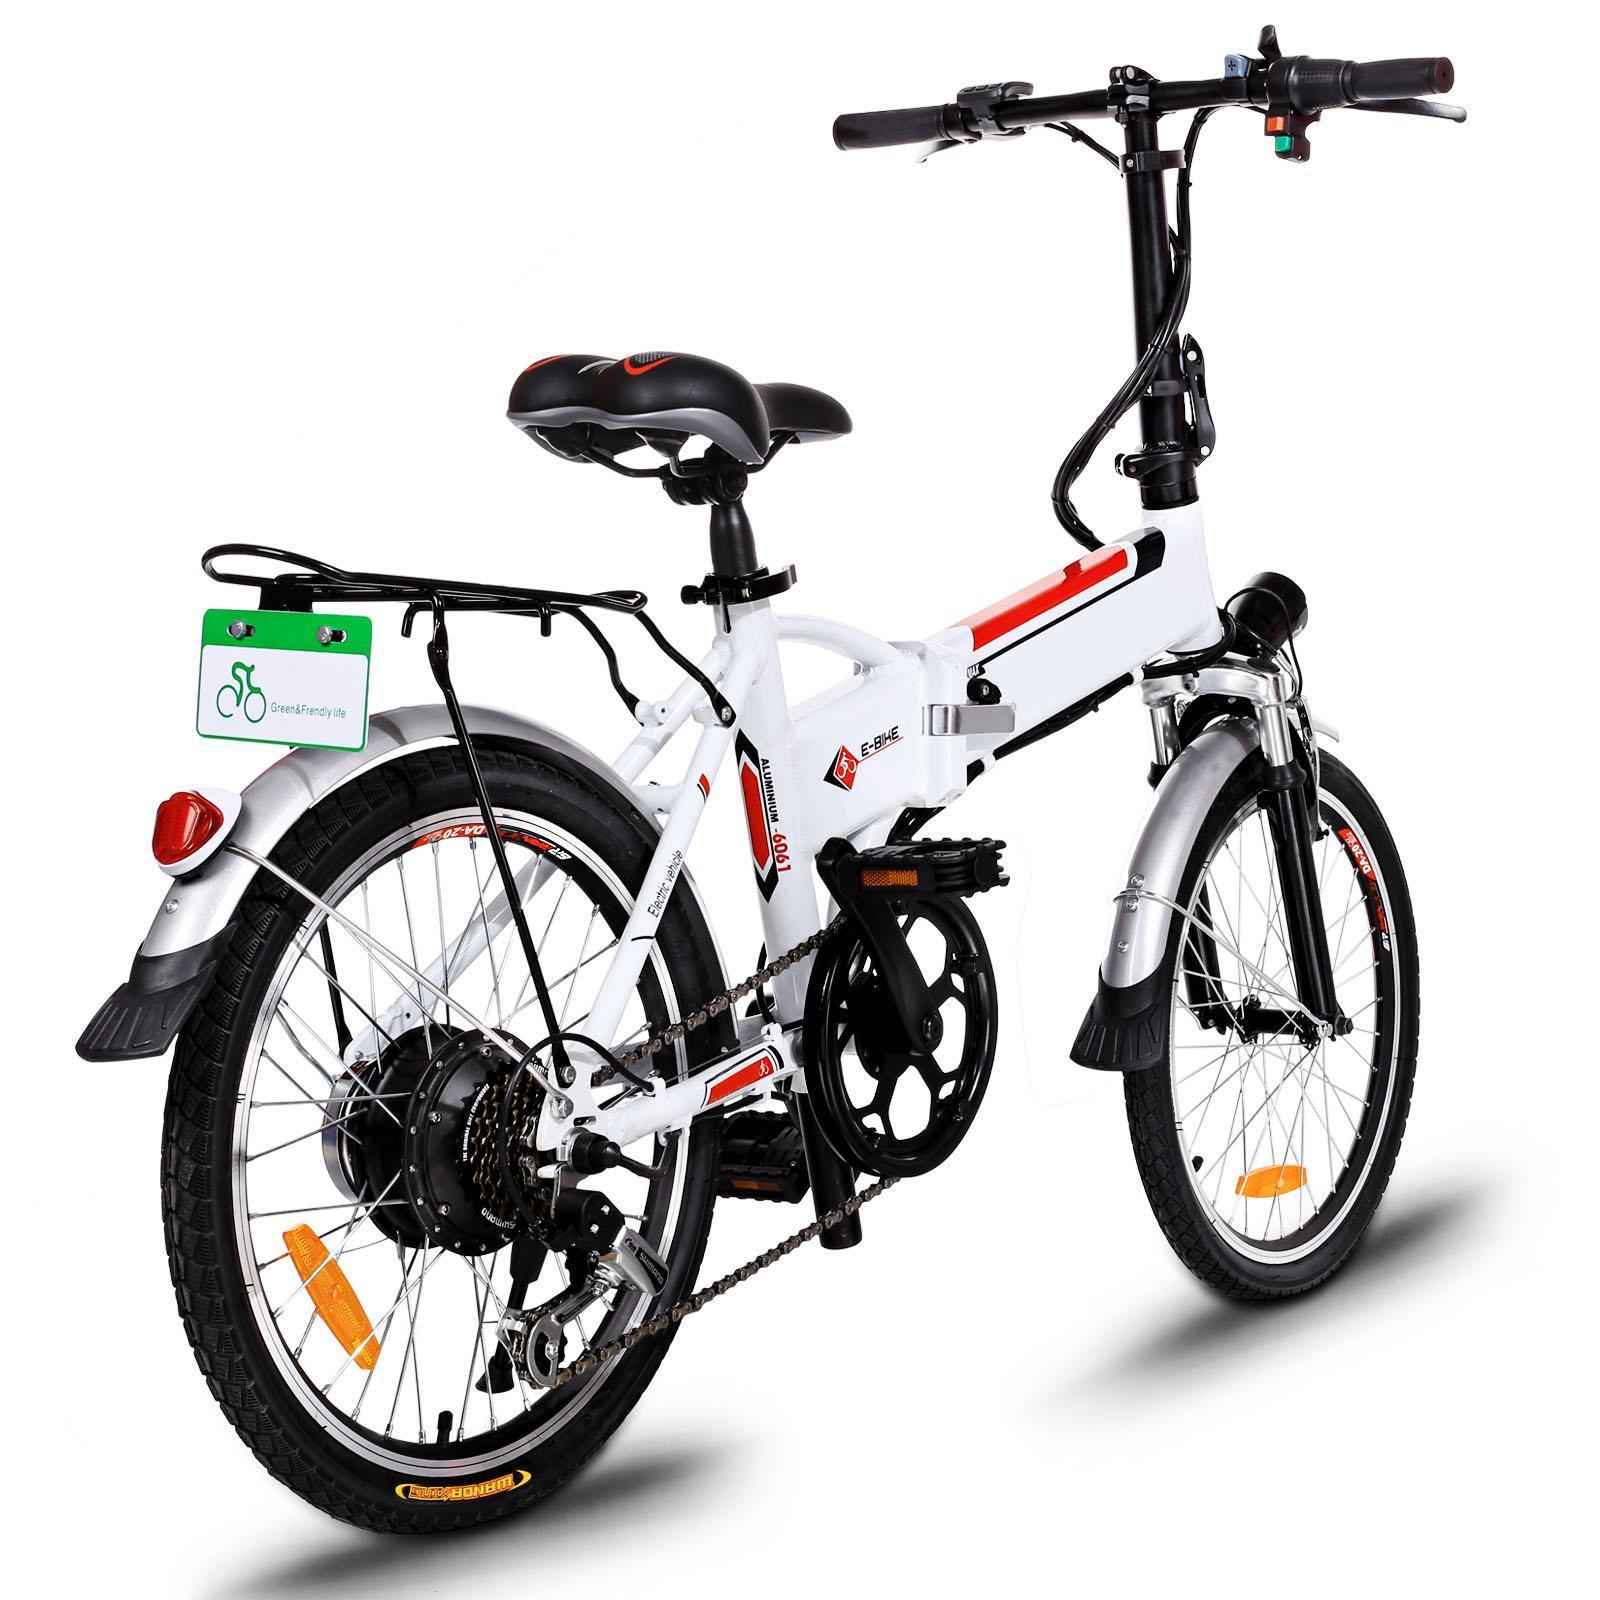 18.7 inch Wheel Aluminum Alloy Frame Folding Mountain Bike Cycling Bicycle White 1